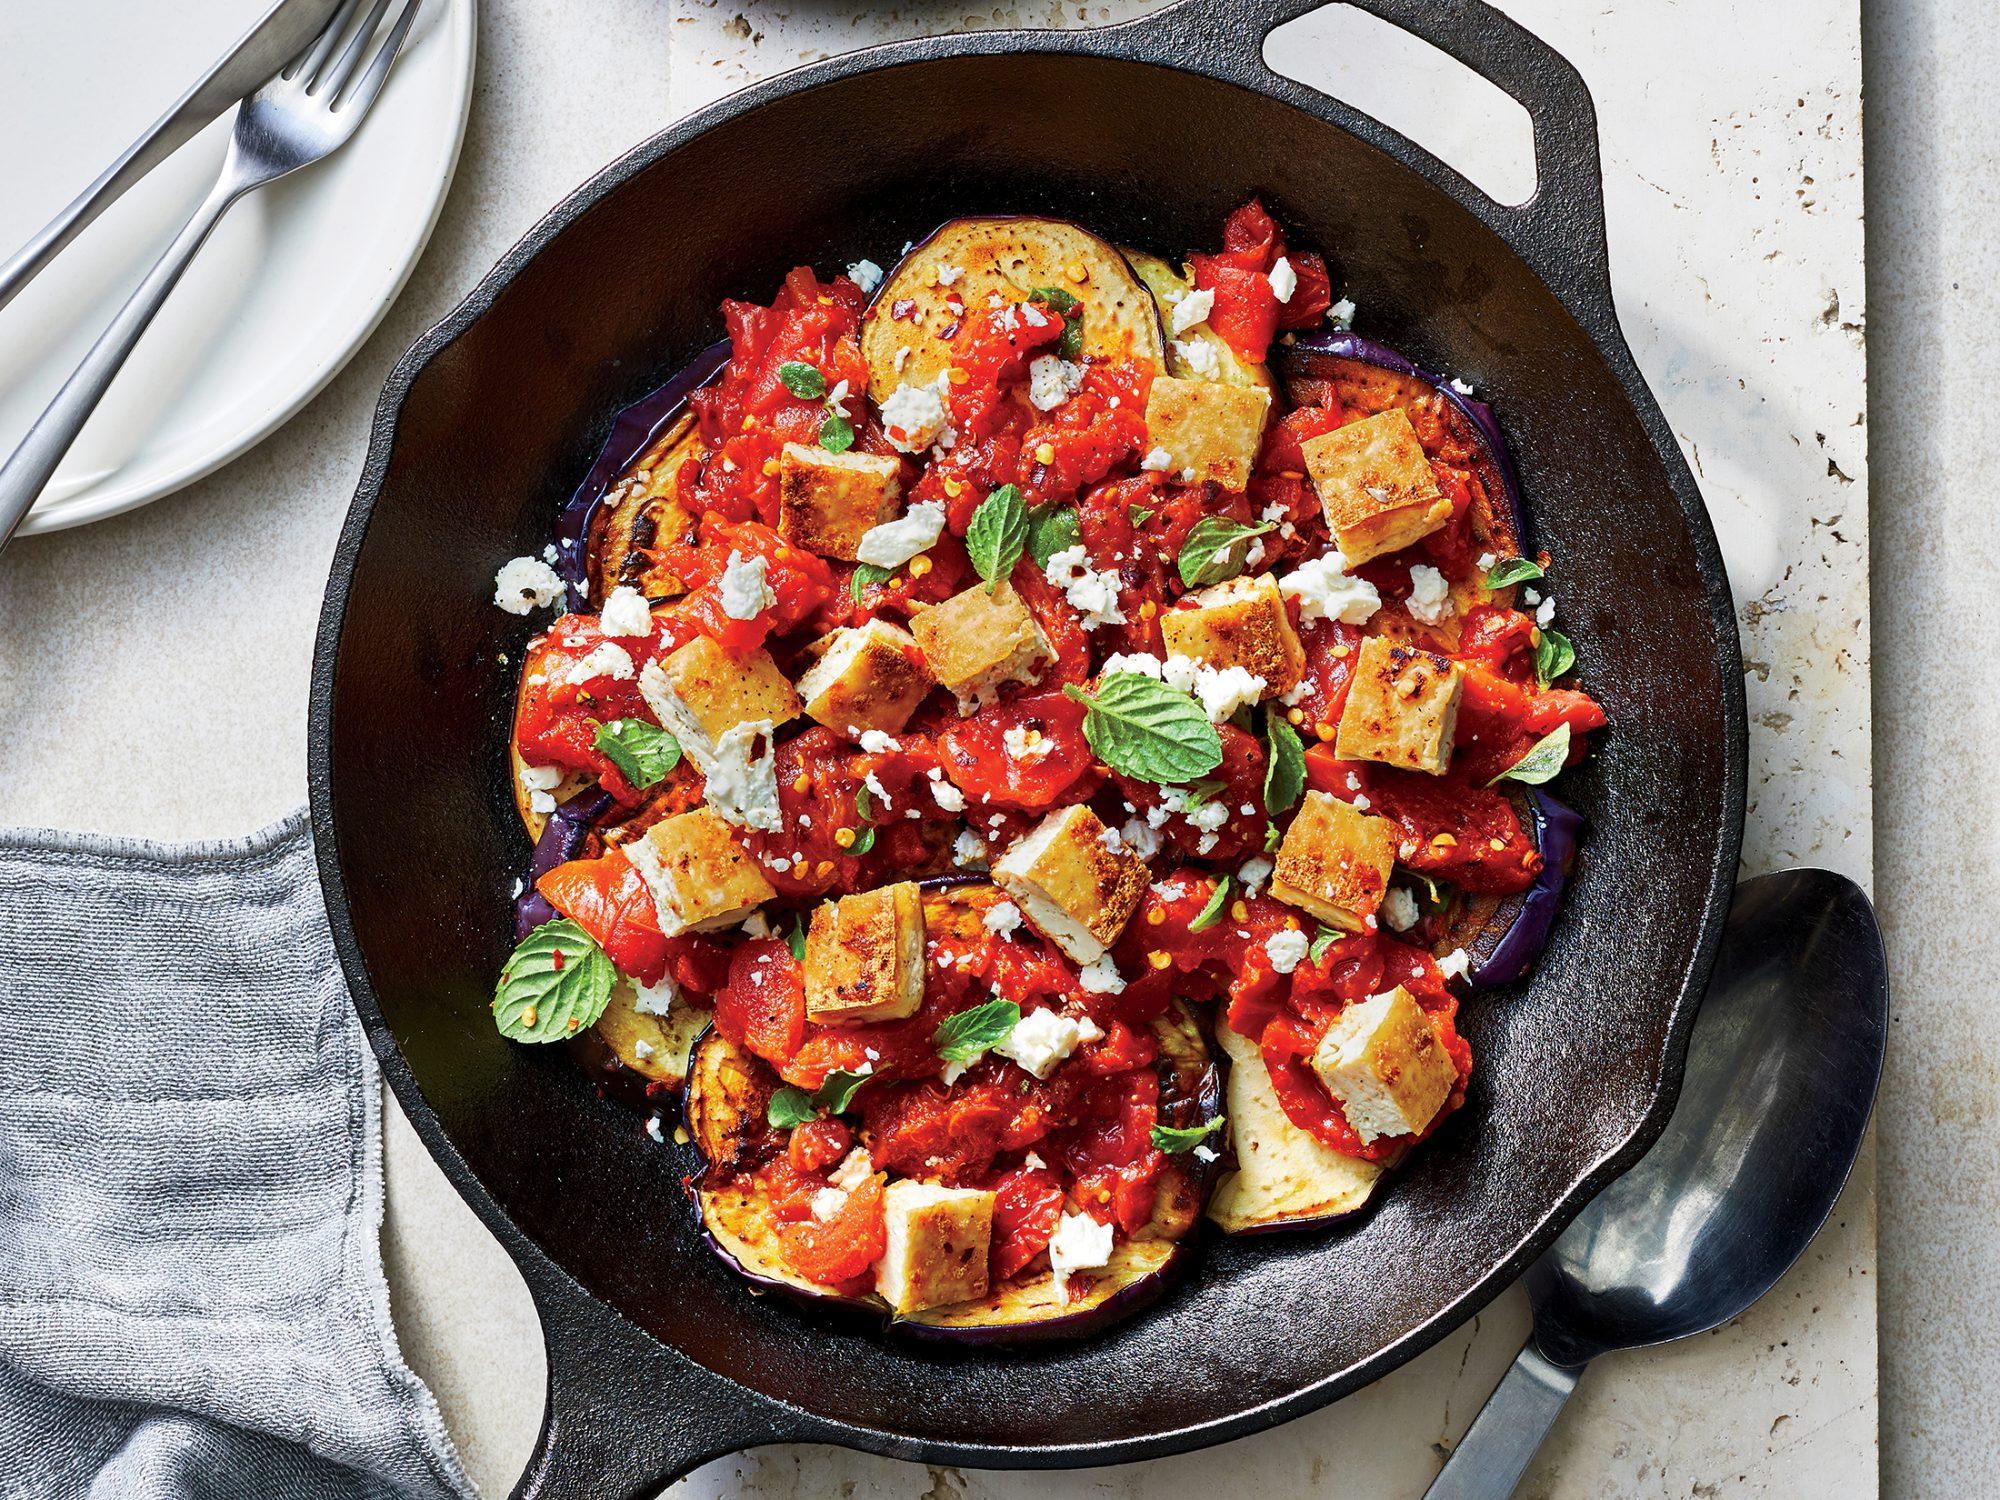 Greek Eggplant Skillet Dinner